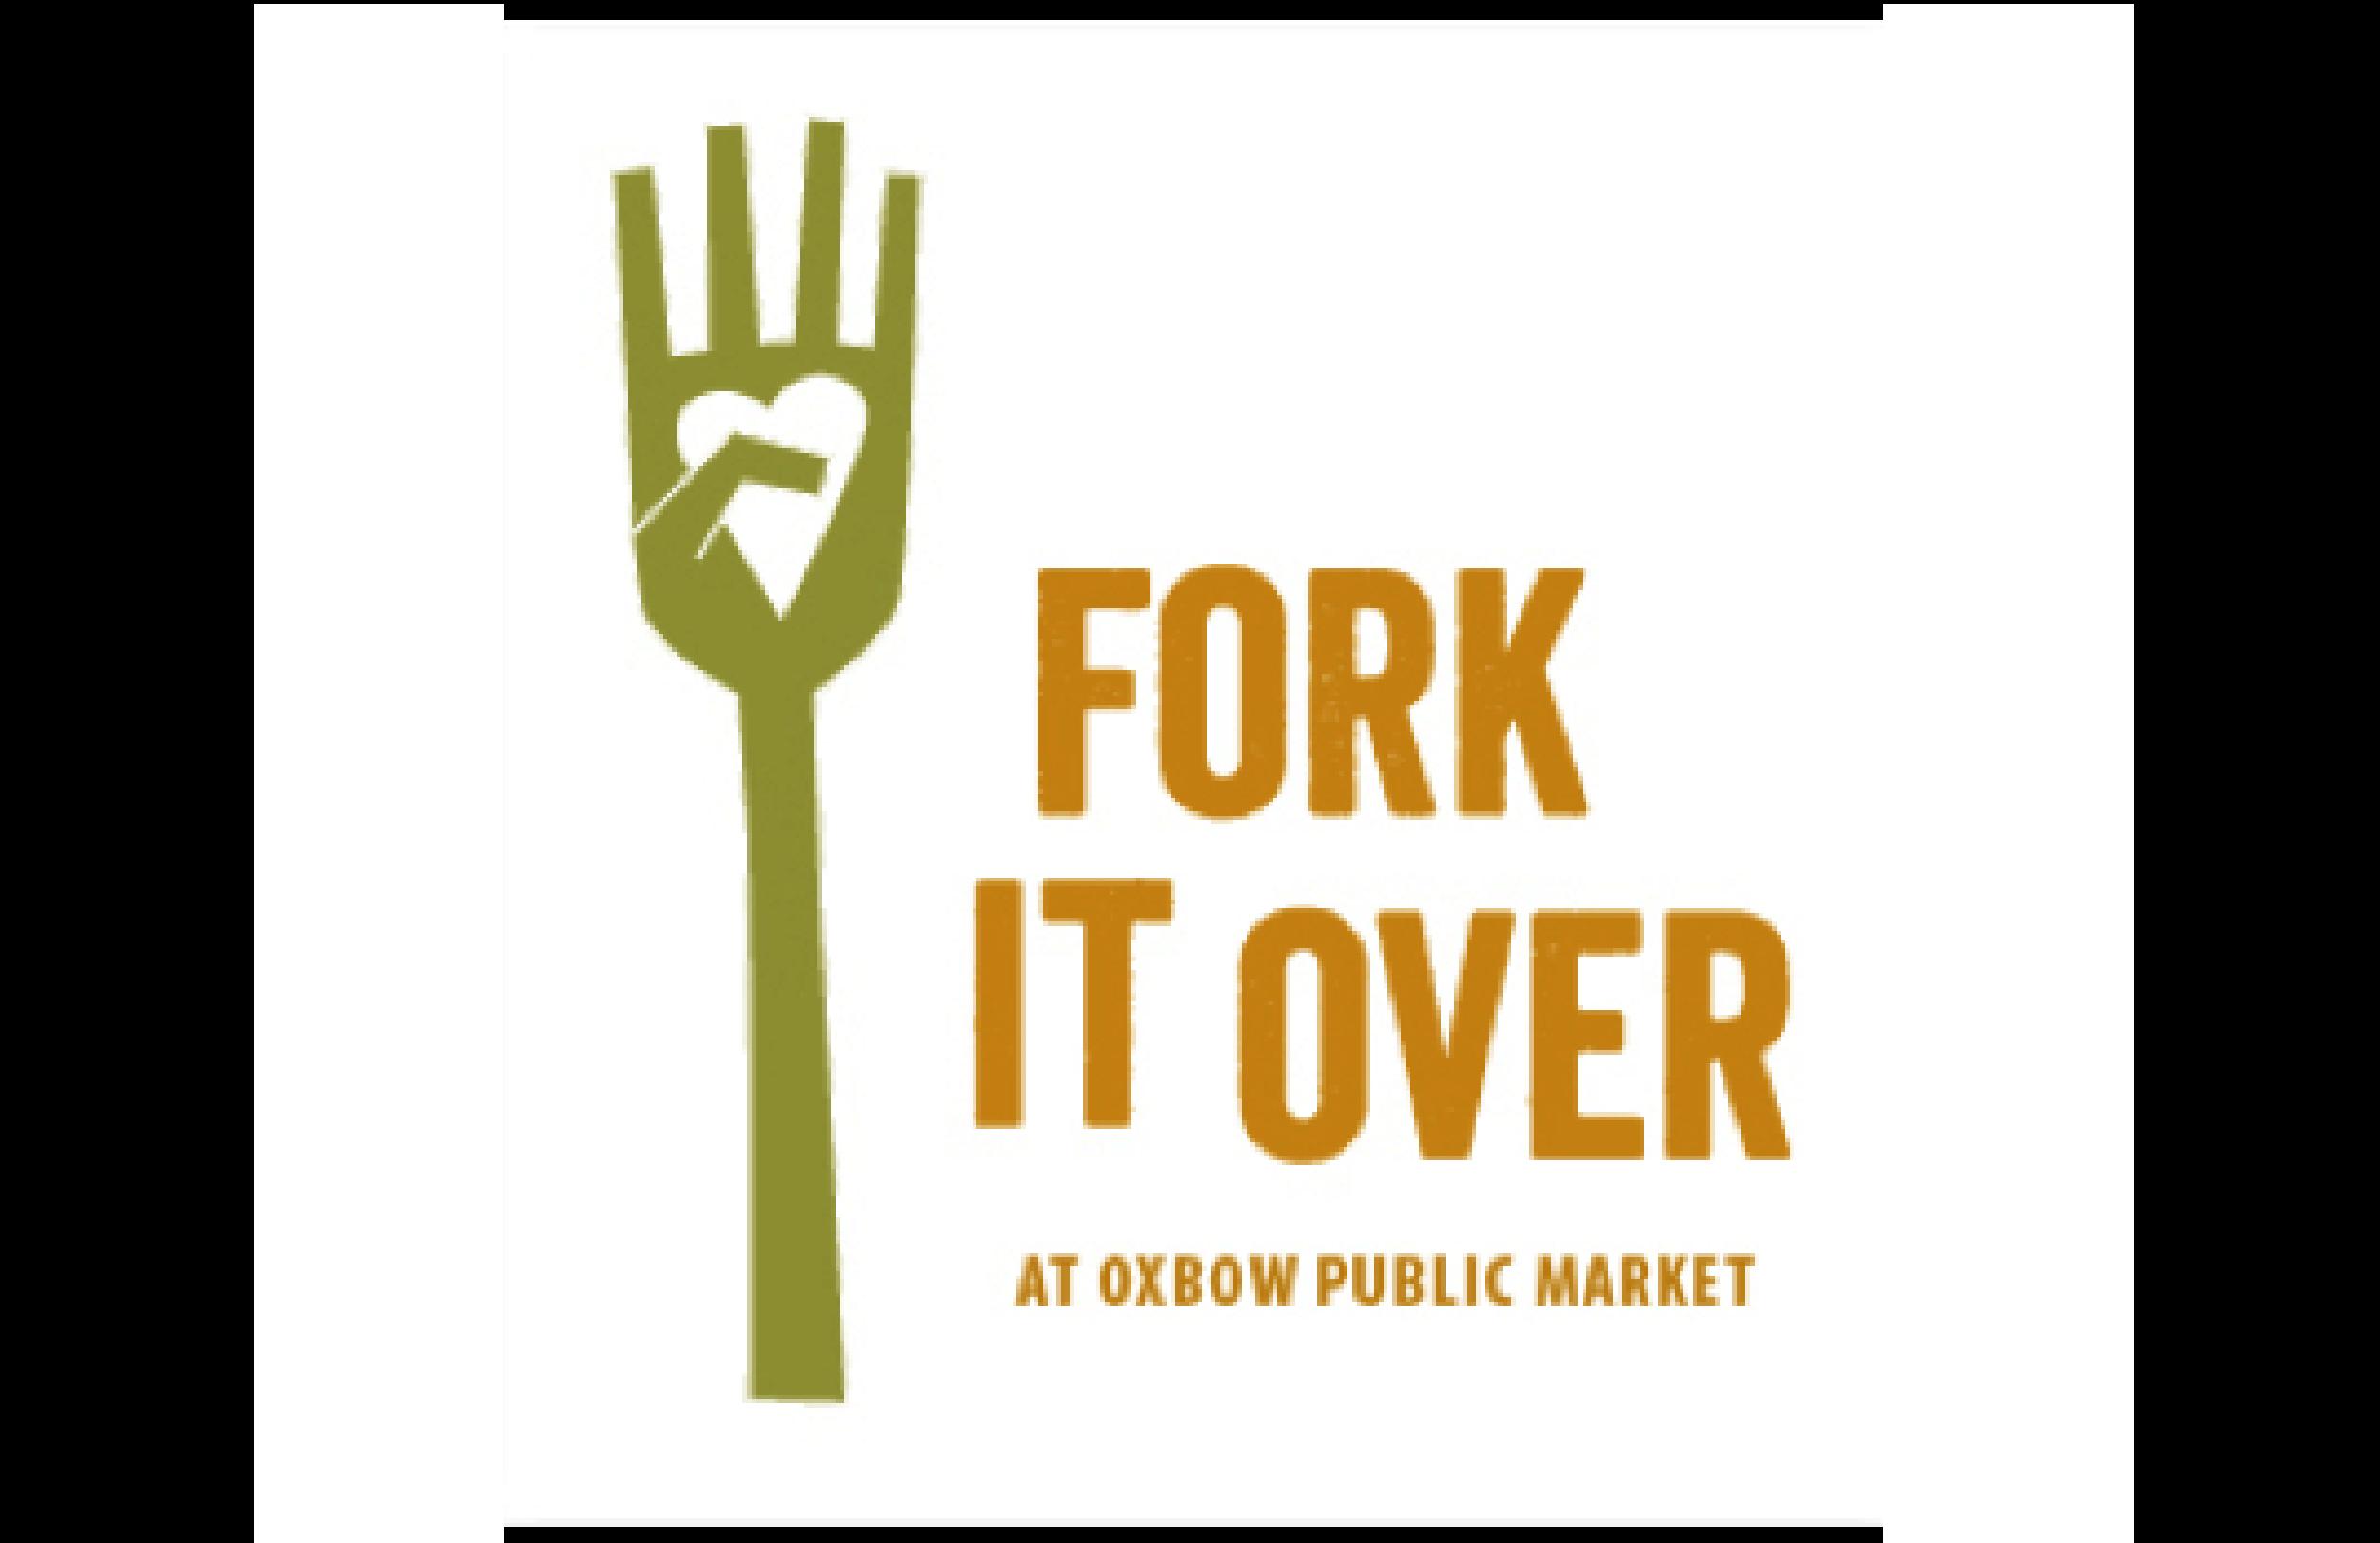 hello-ortho-philanthropy-logos-fork-it-over